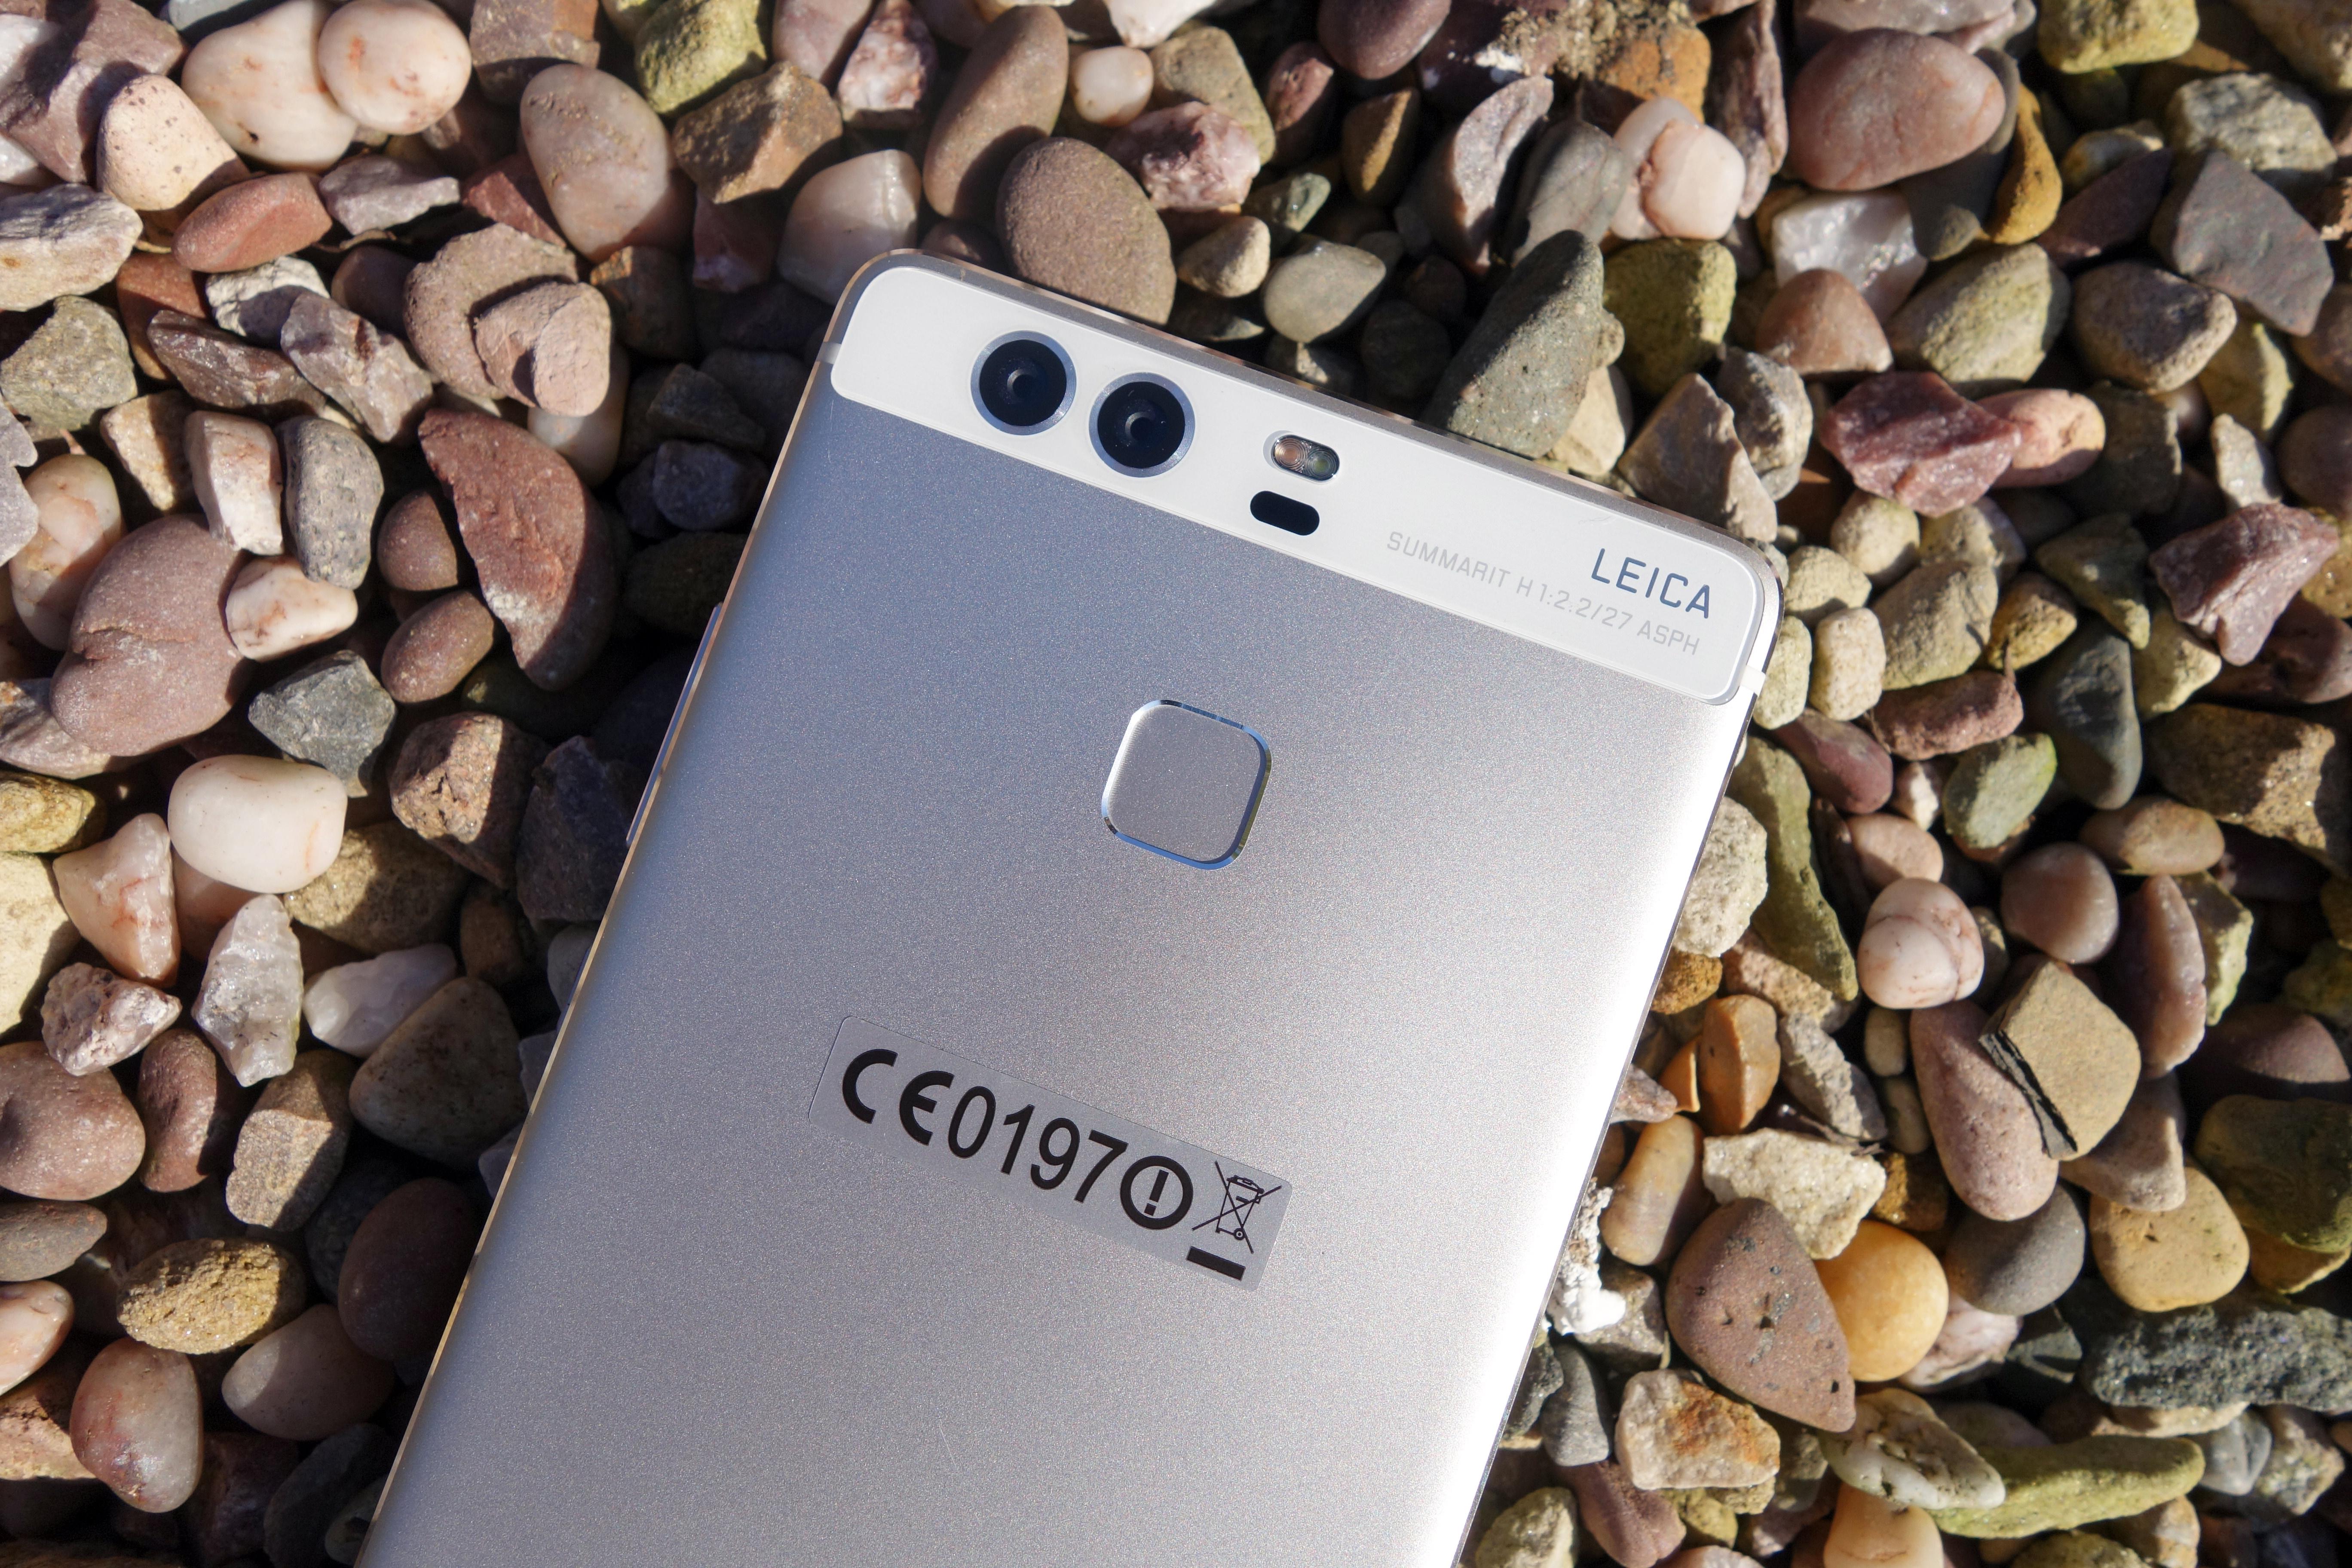 Huawei P9 Leica Smart Phone Camera Review | ePHOTOzine